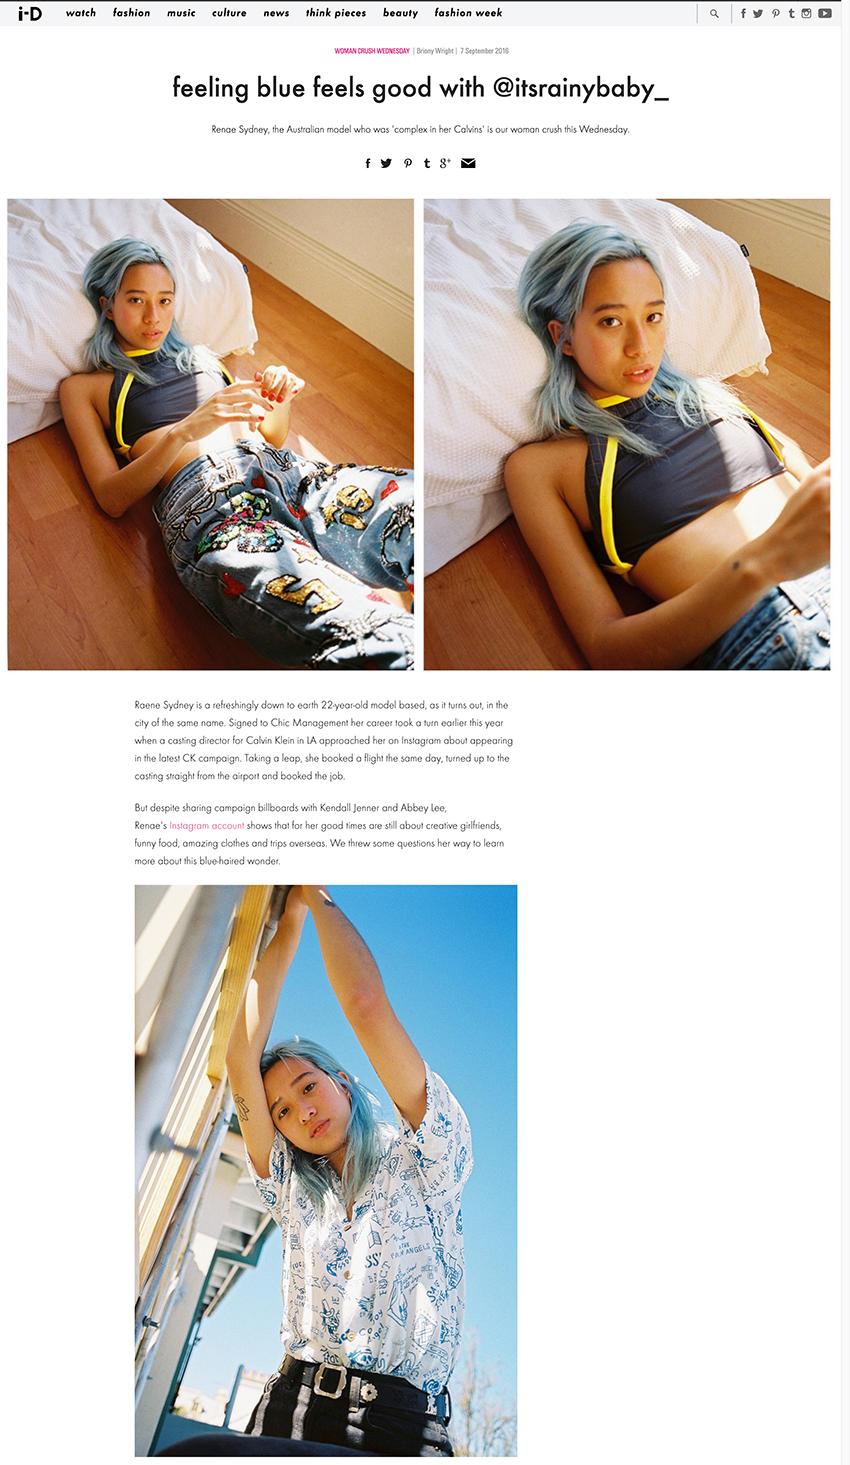 Raenee_IDMagazine_ChicManagementNews